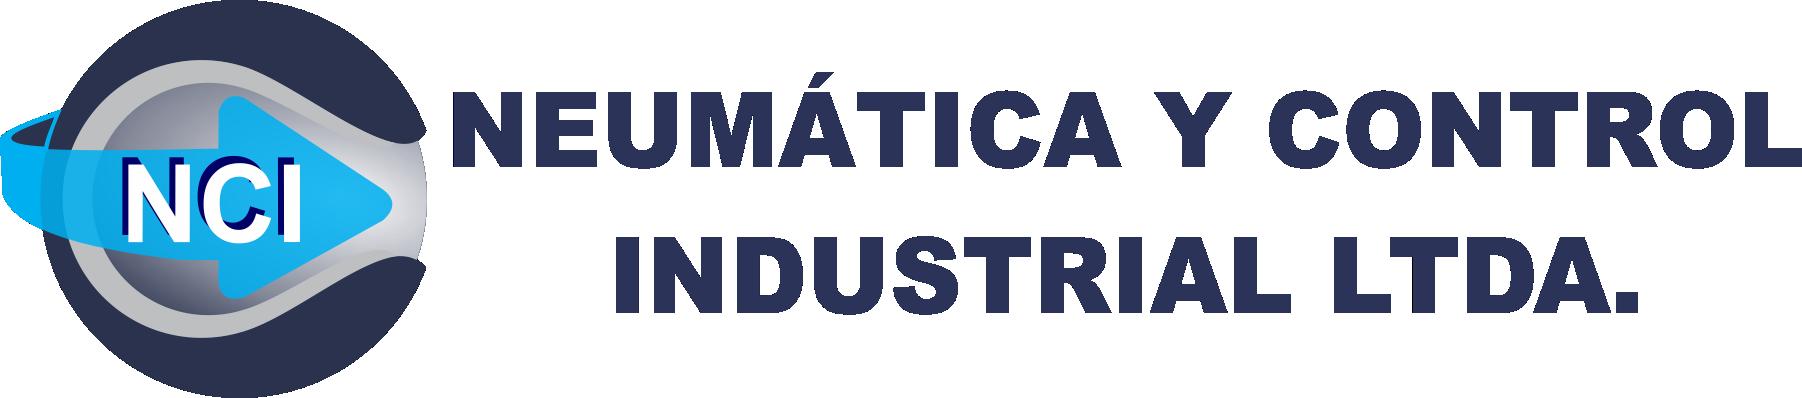 Neumática y Control Industrial